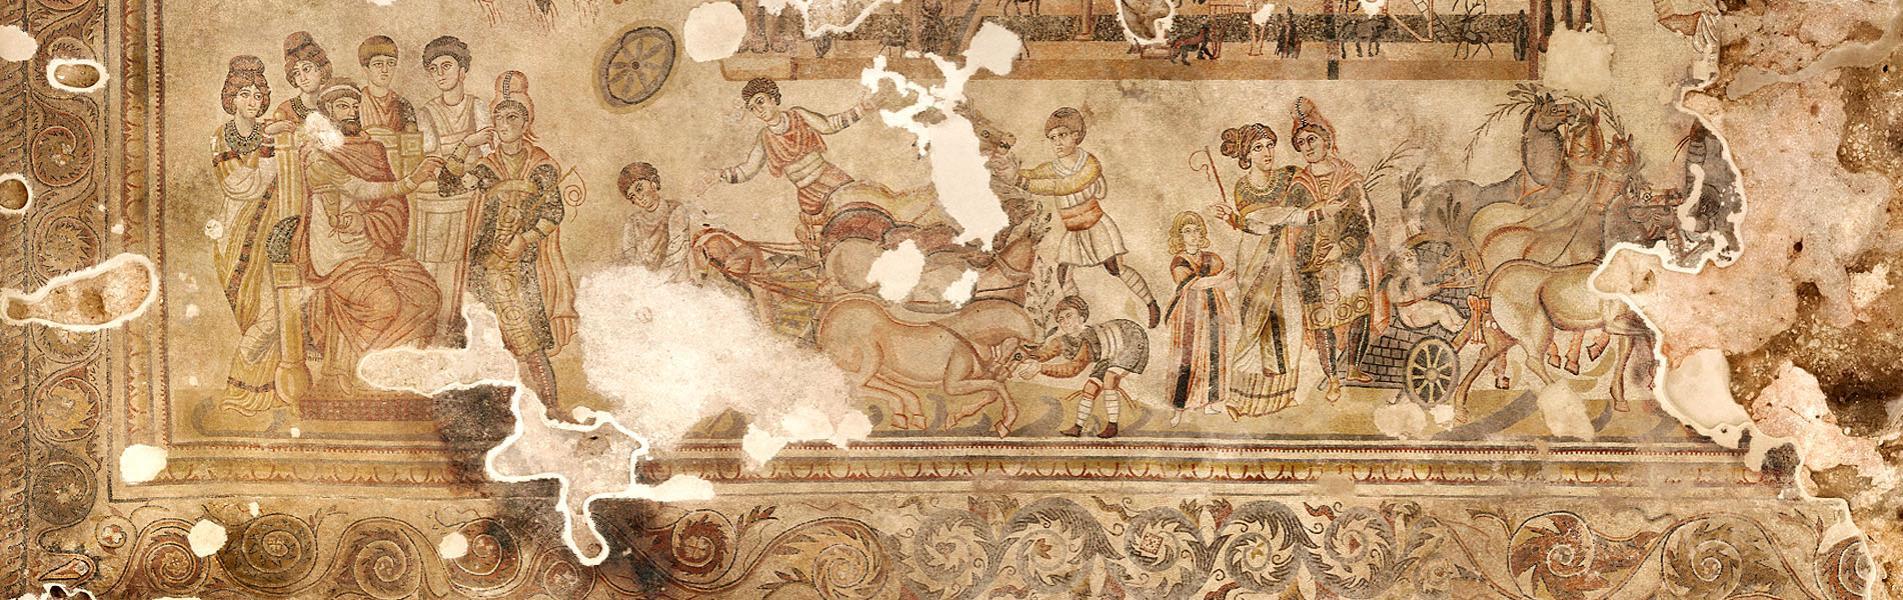 Noheda, la Pompeya española